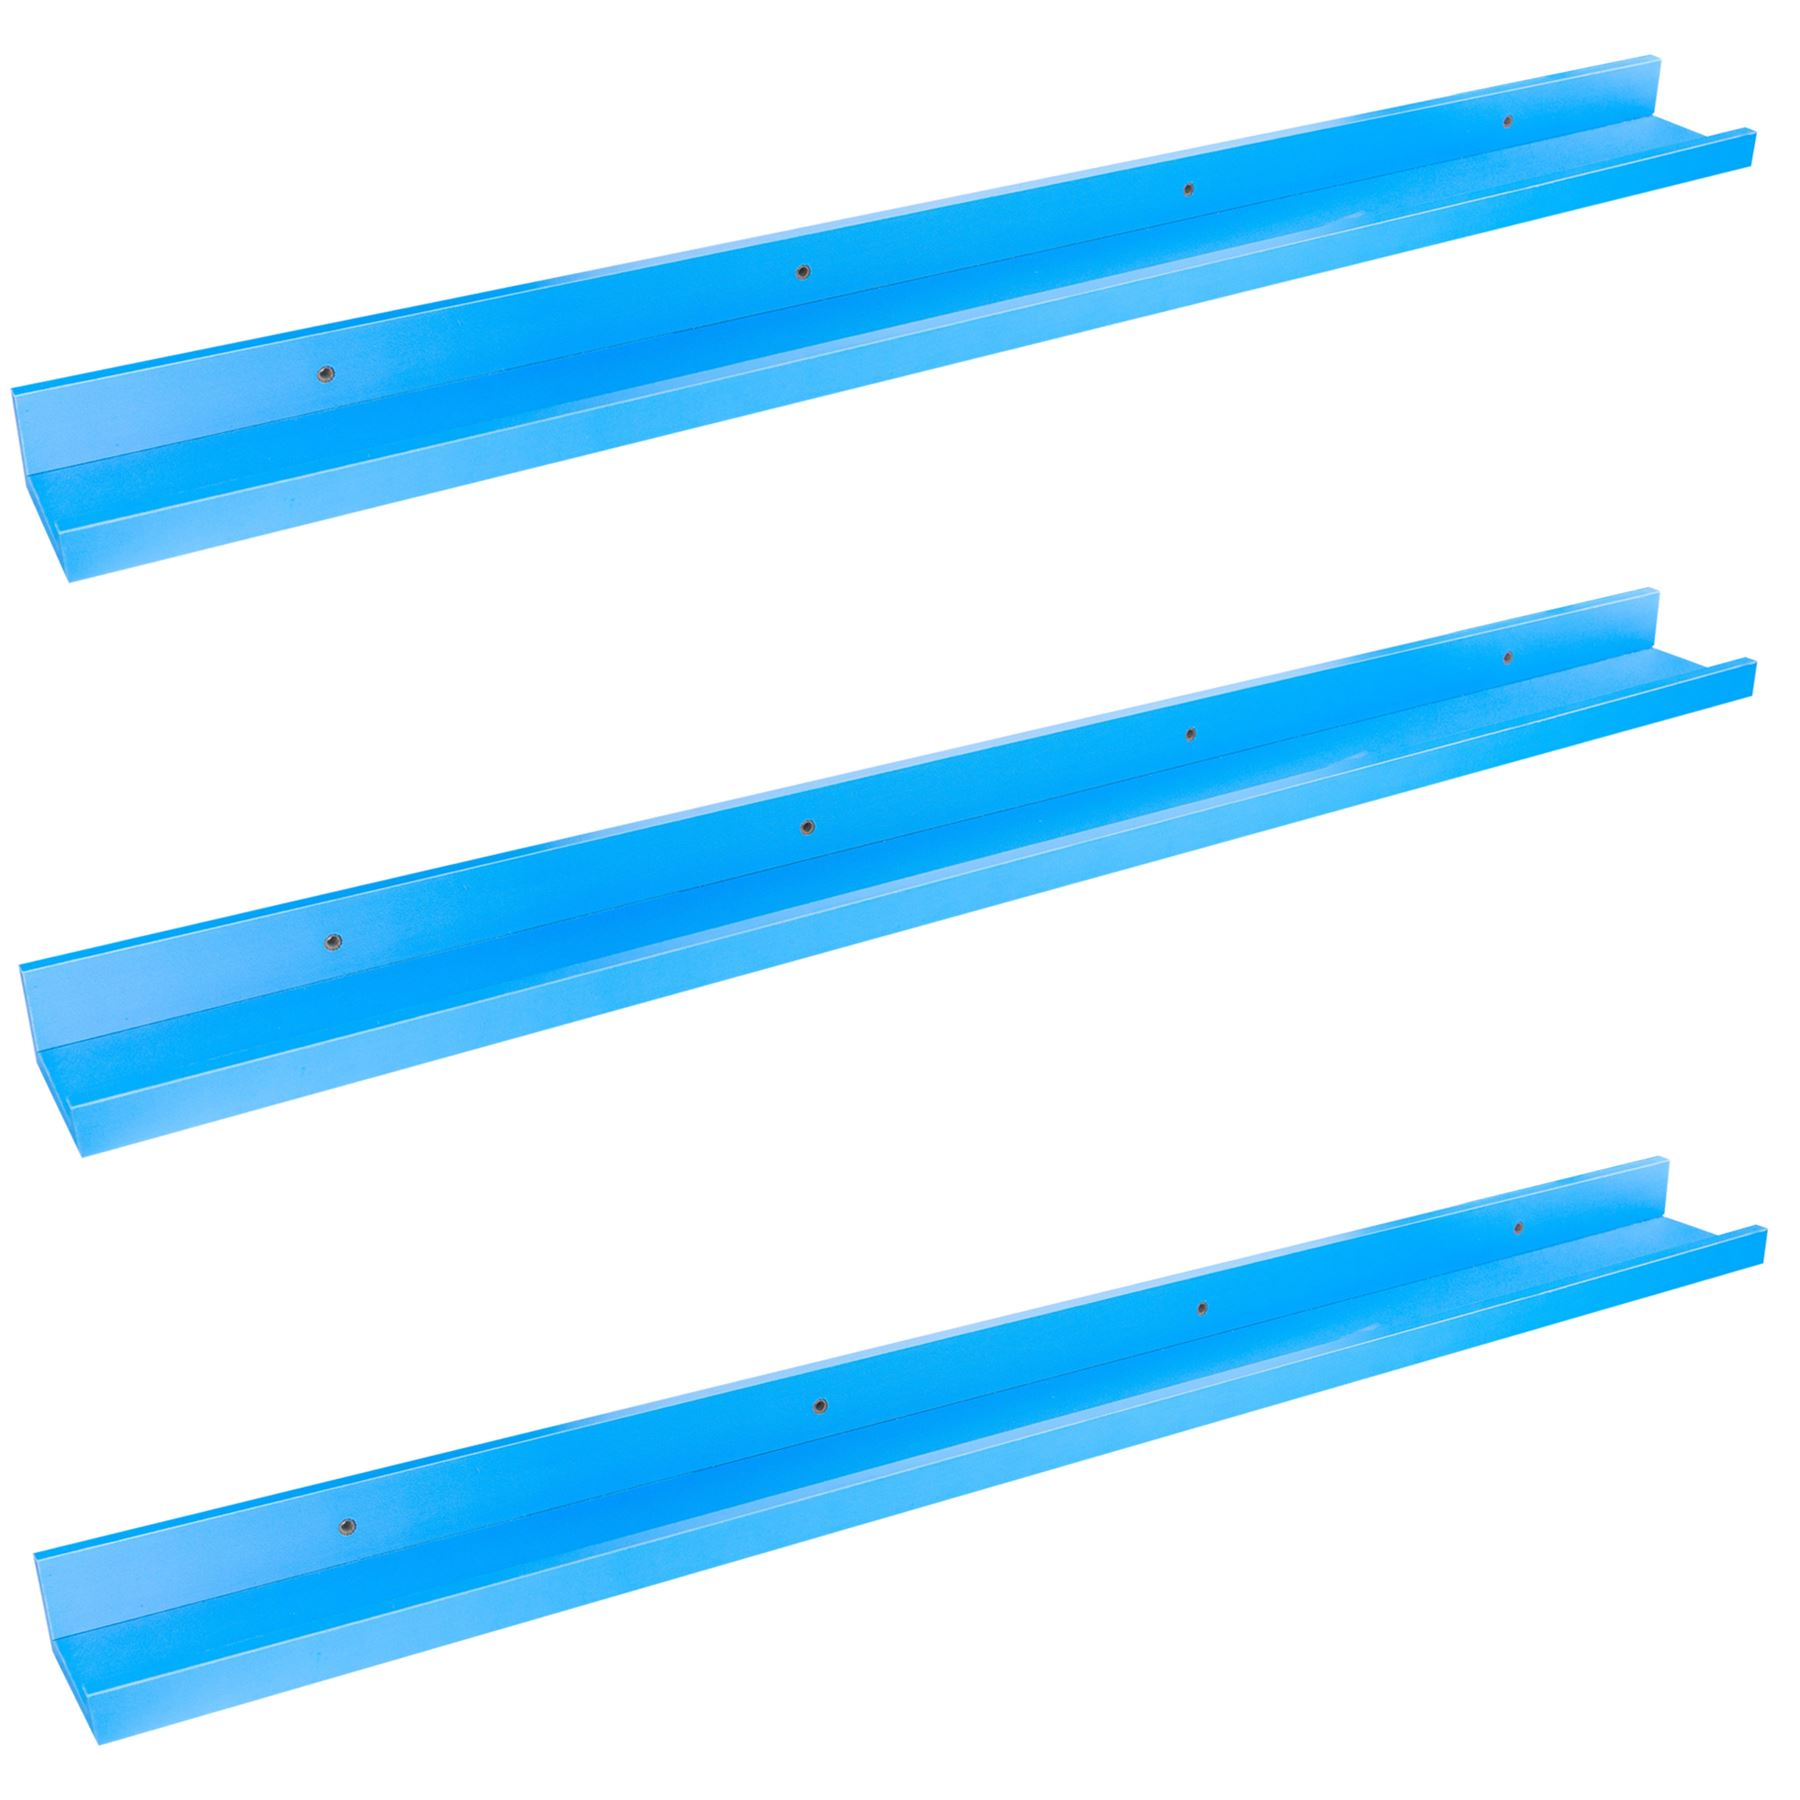 91.5cm Children/'s Bedroom Bookshelf Floating Nursery Gallery Shelf x3 Blue